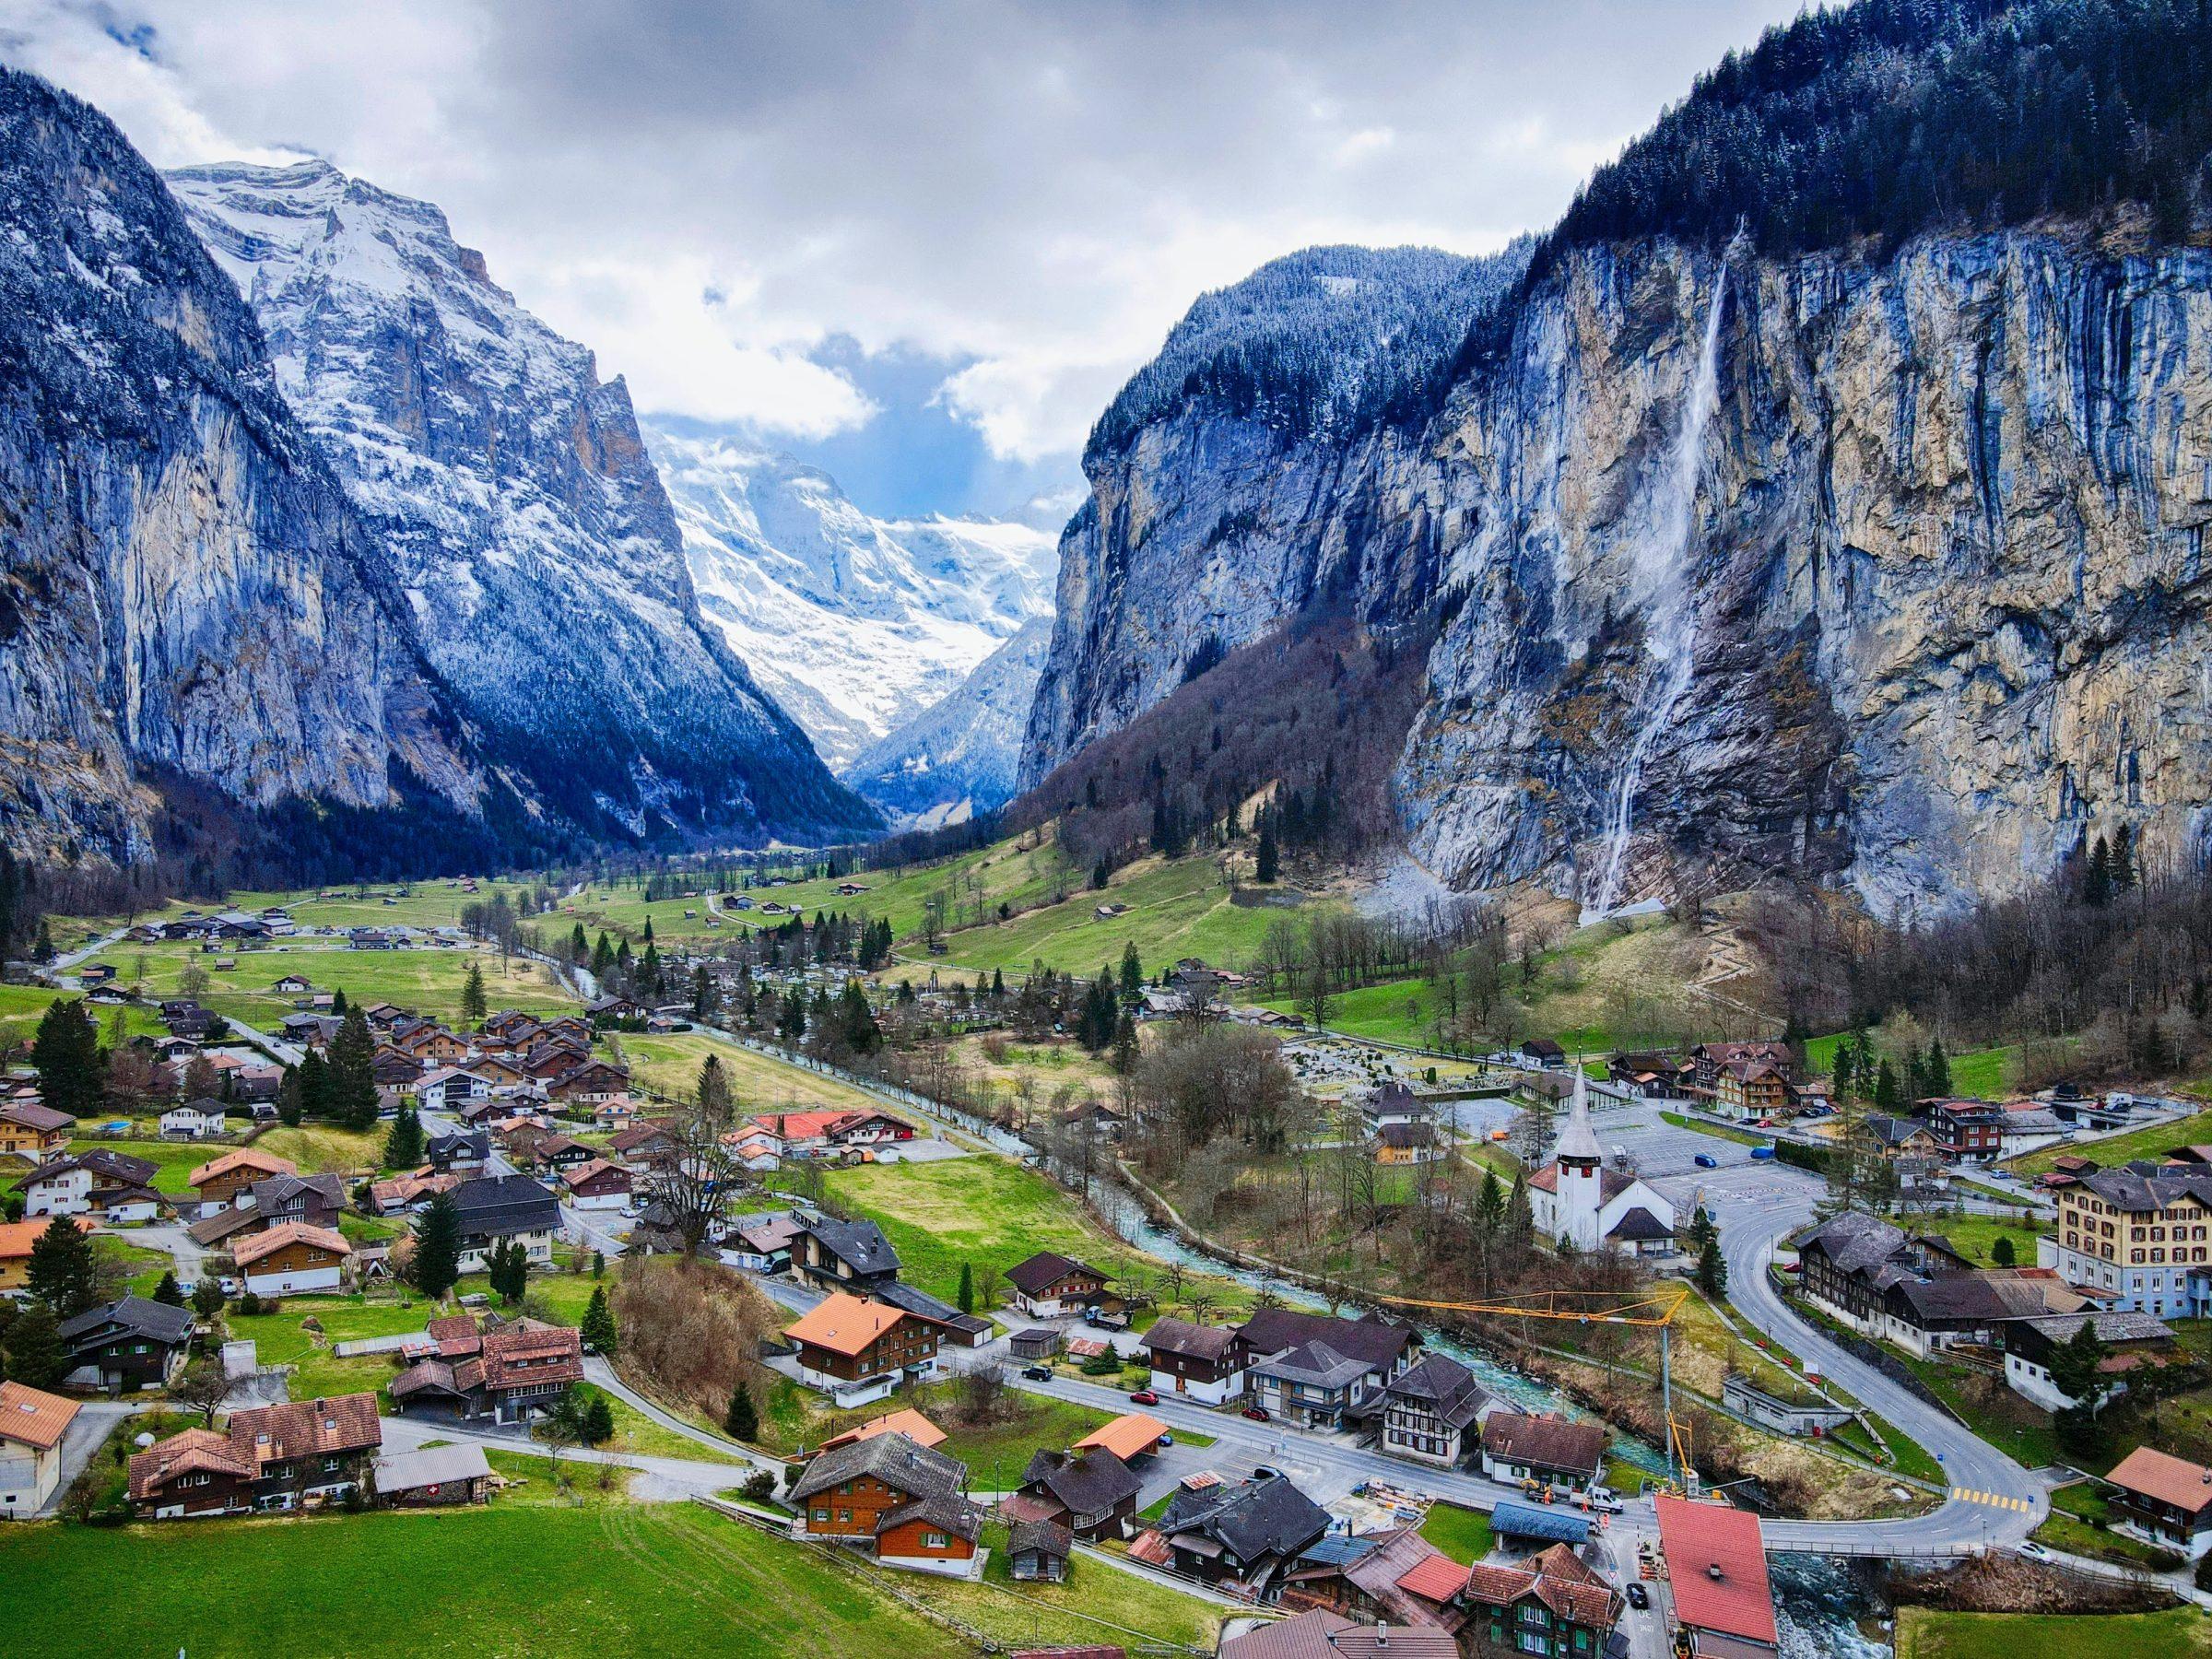 Lauterbrunnen en de Staubbach waterval, Zwitserland